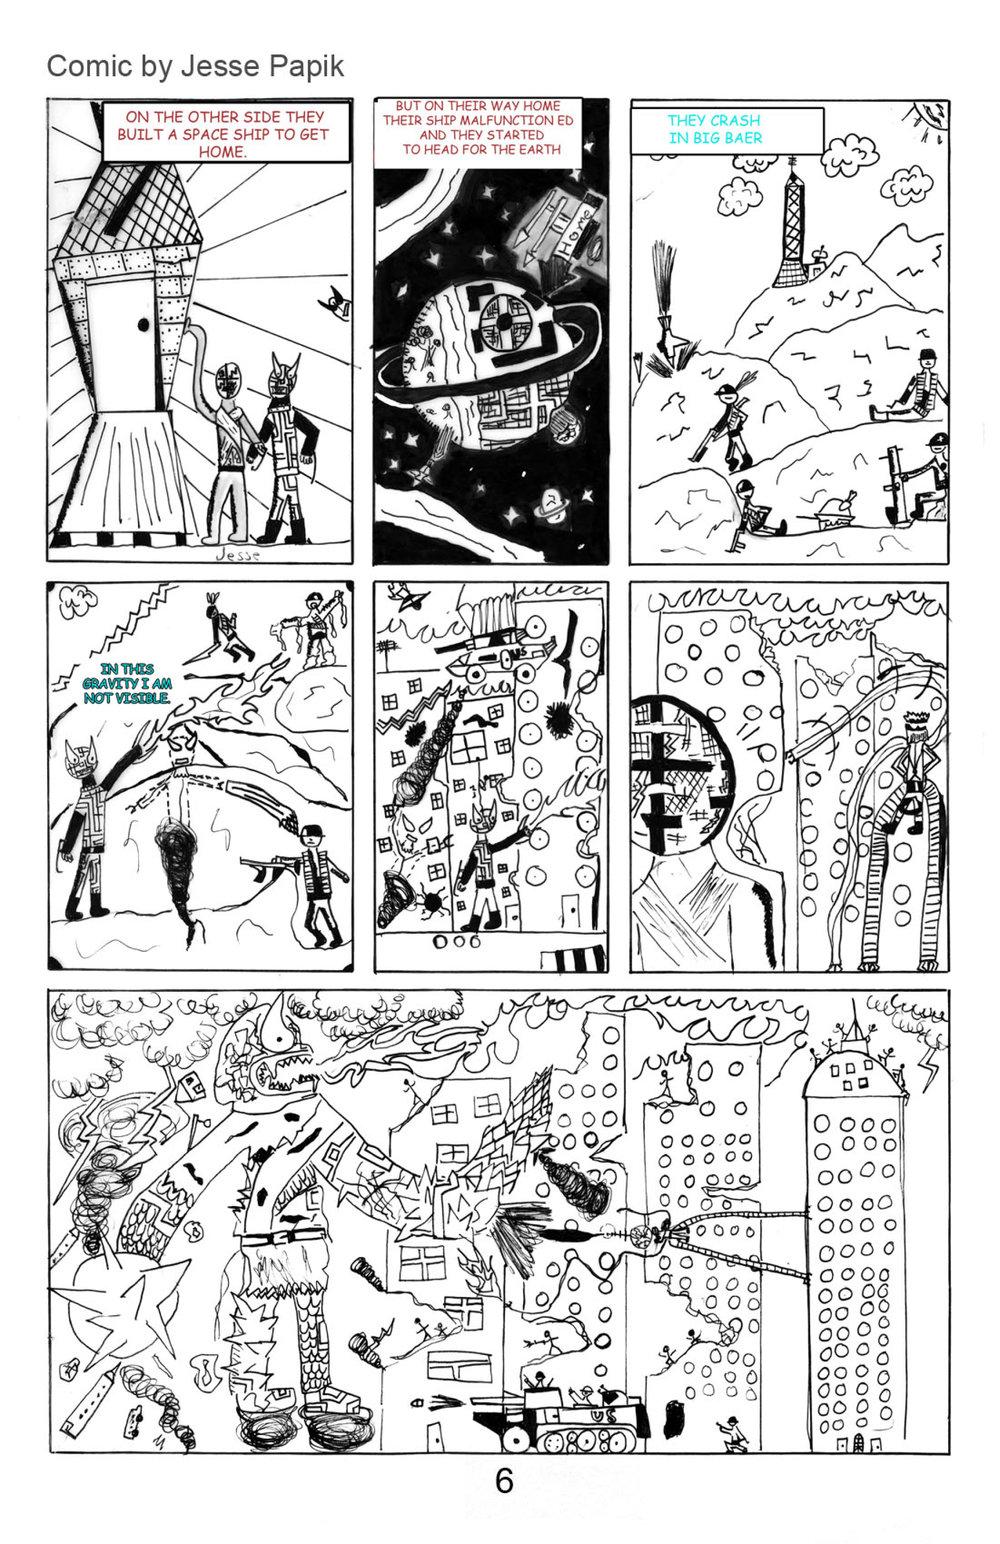 ev page 6.jpg